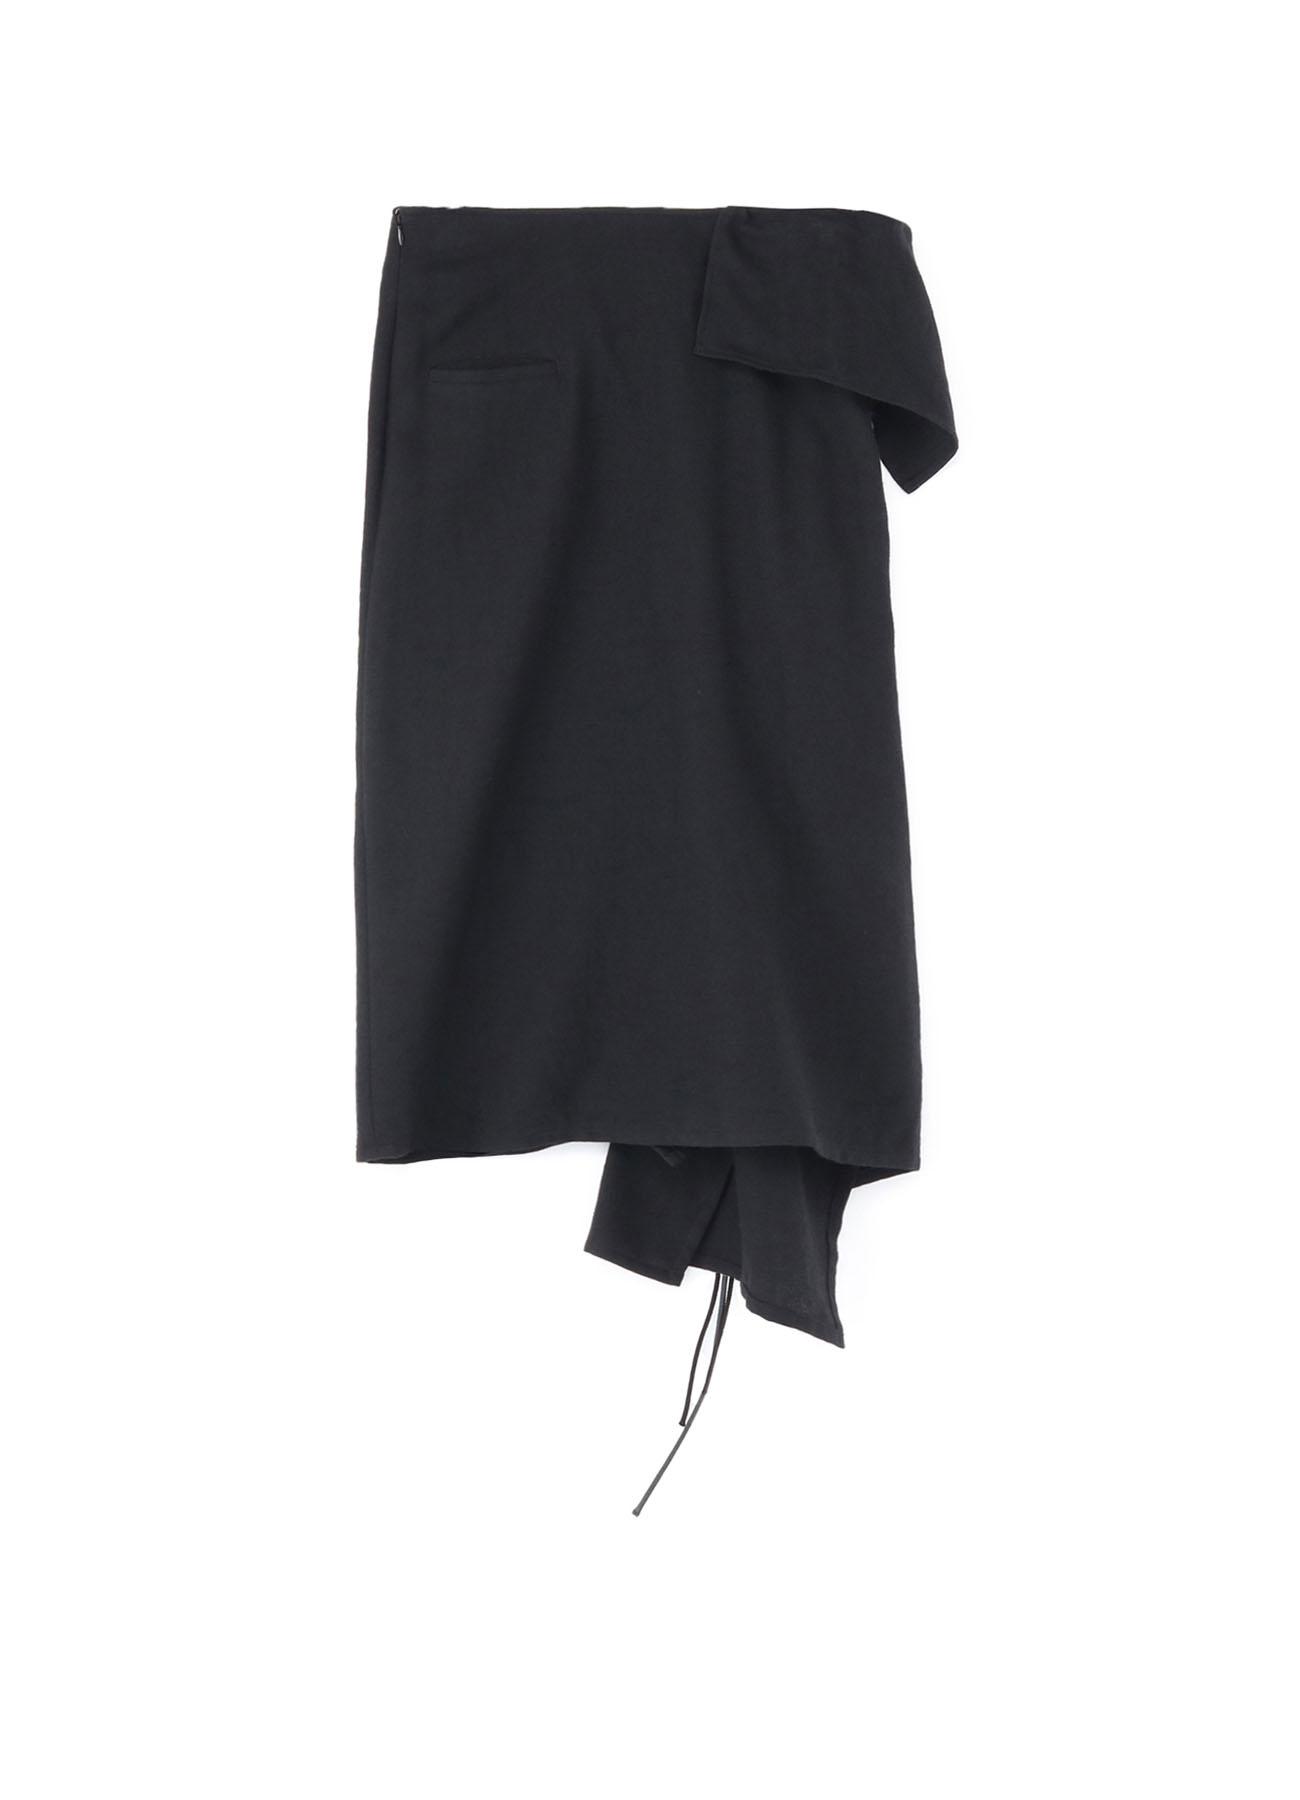 Light Serge KnItted Skirt